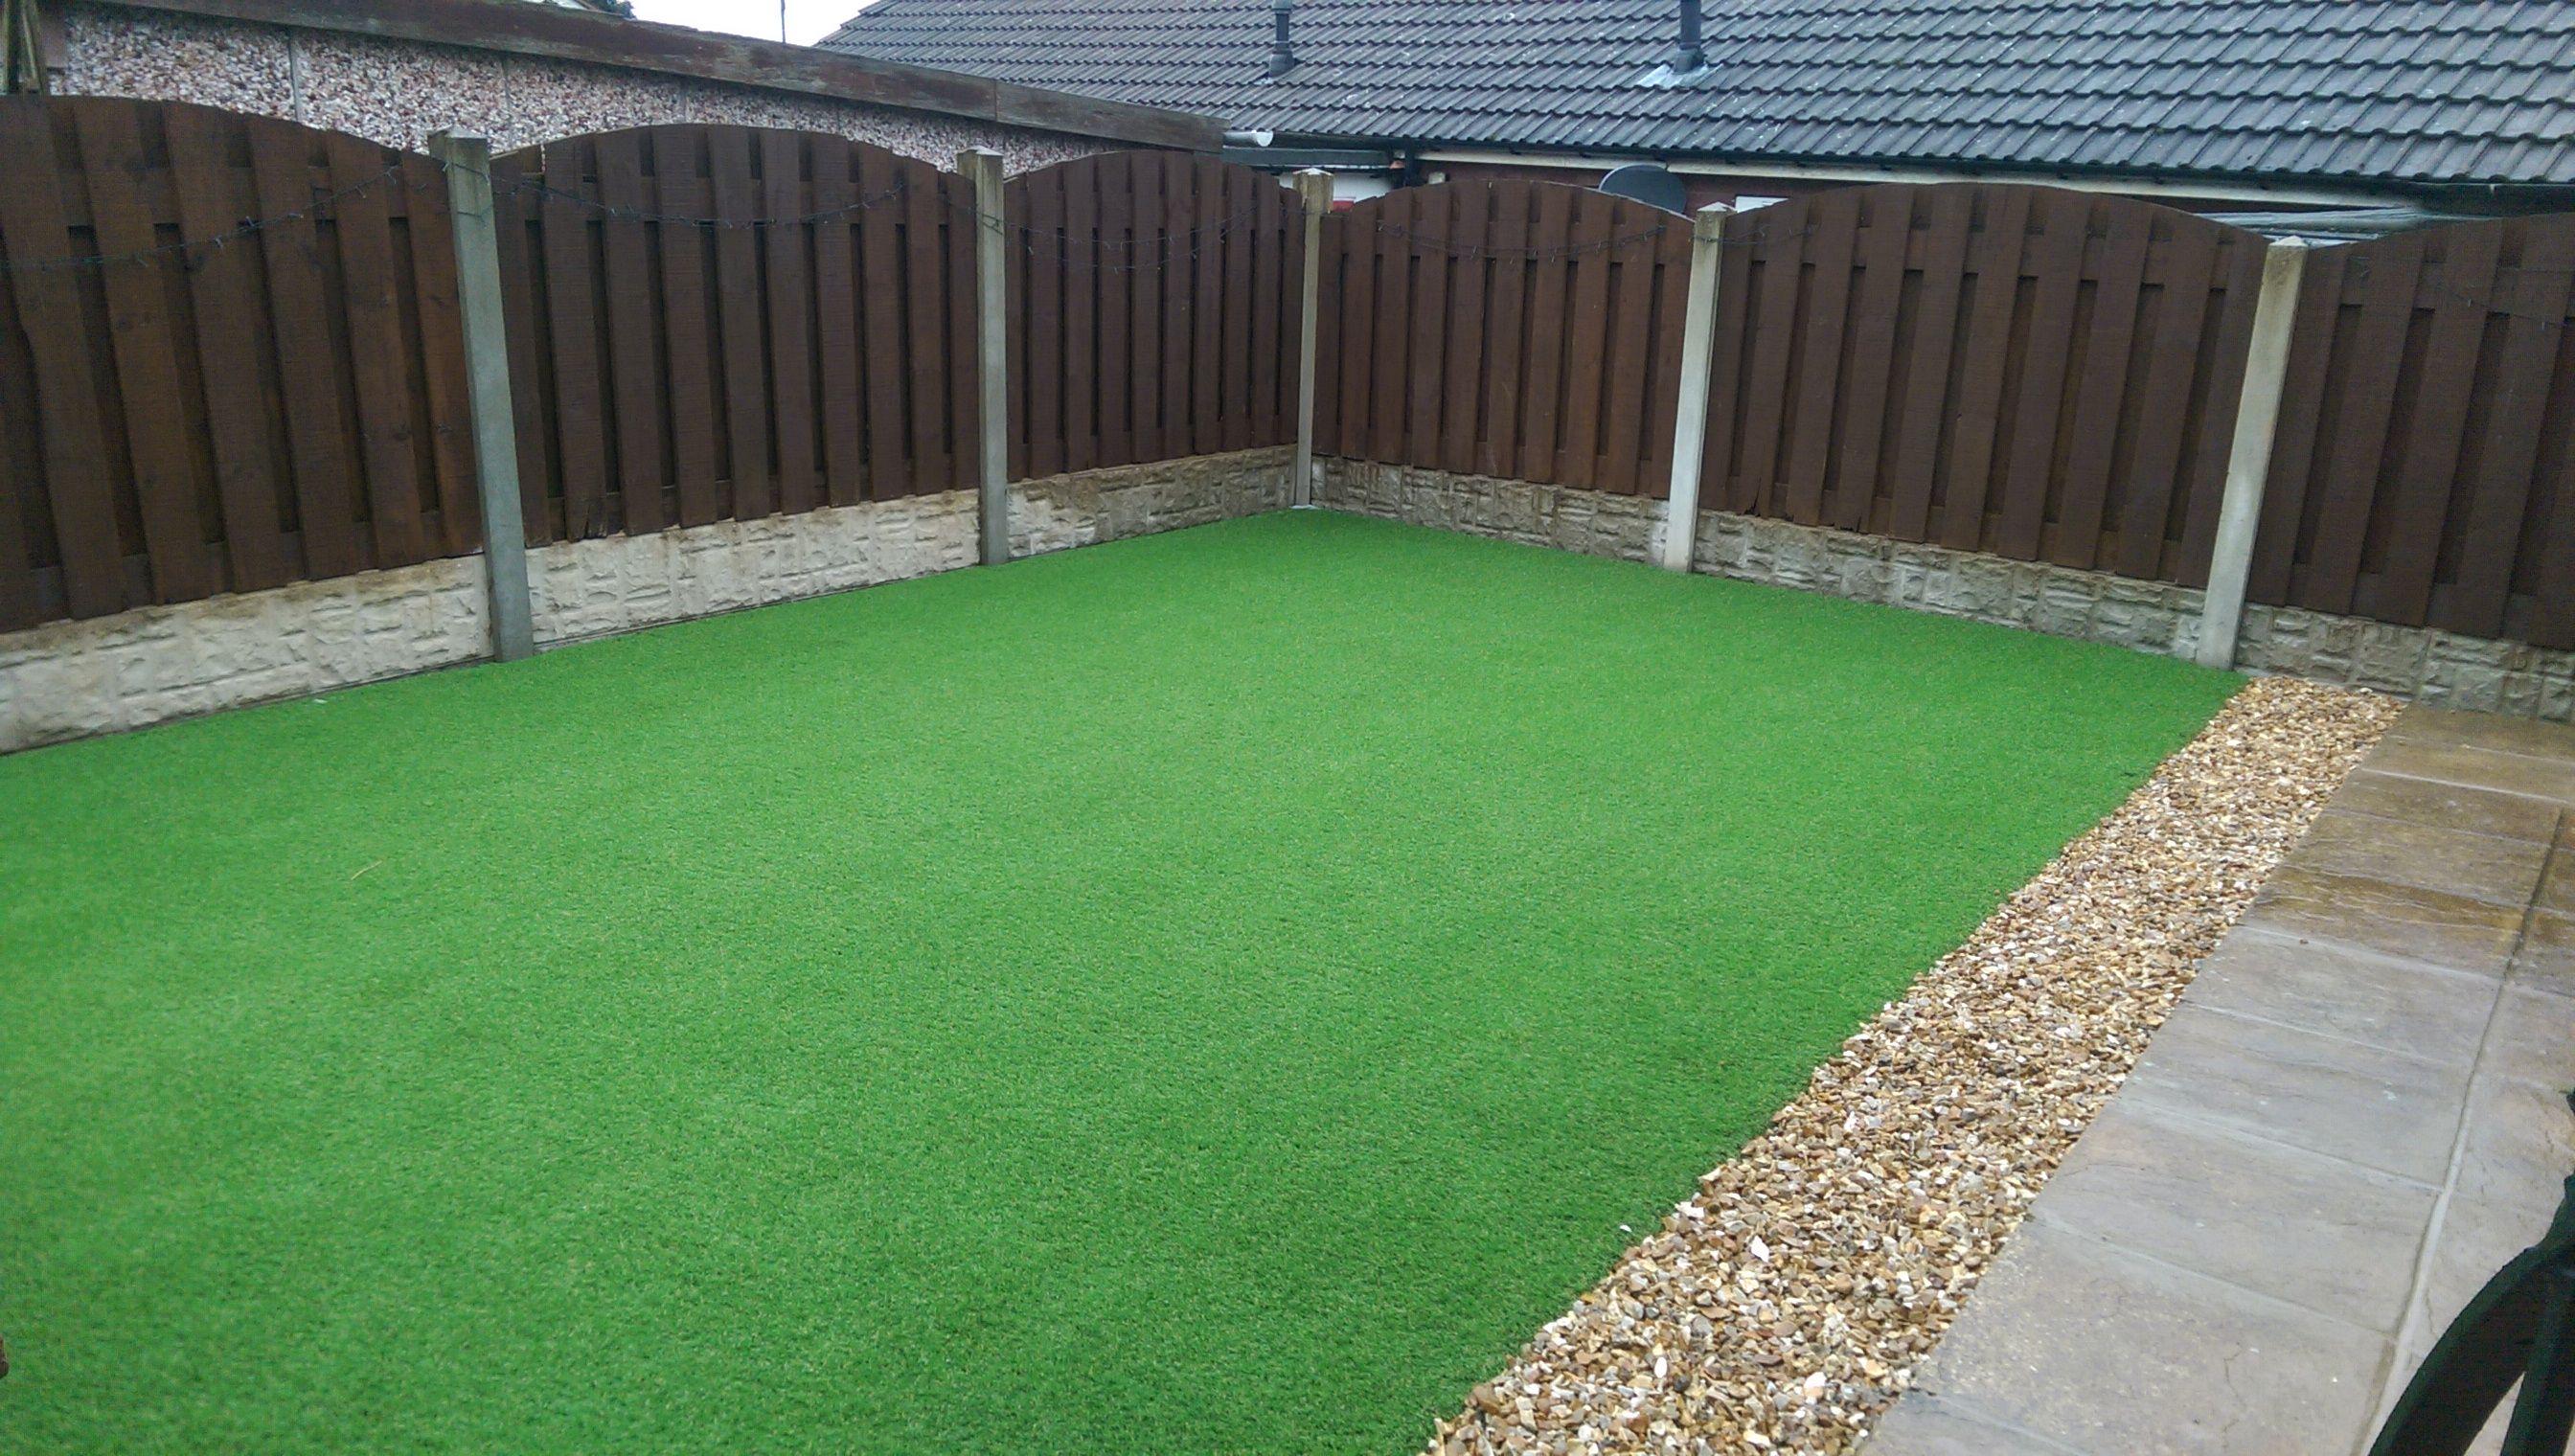 Fußboden Graß Quotes ~ Artificial grass back garden completed with a stone border giving